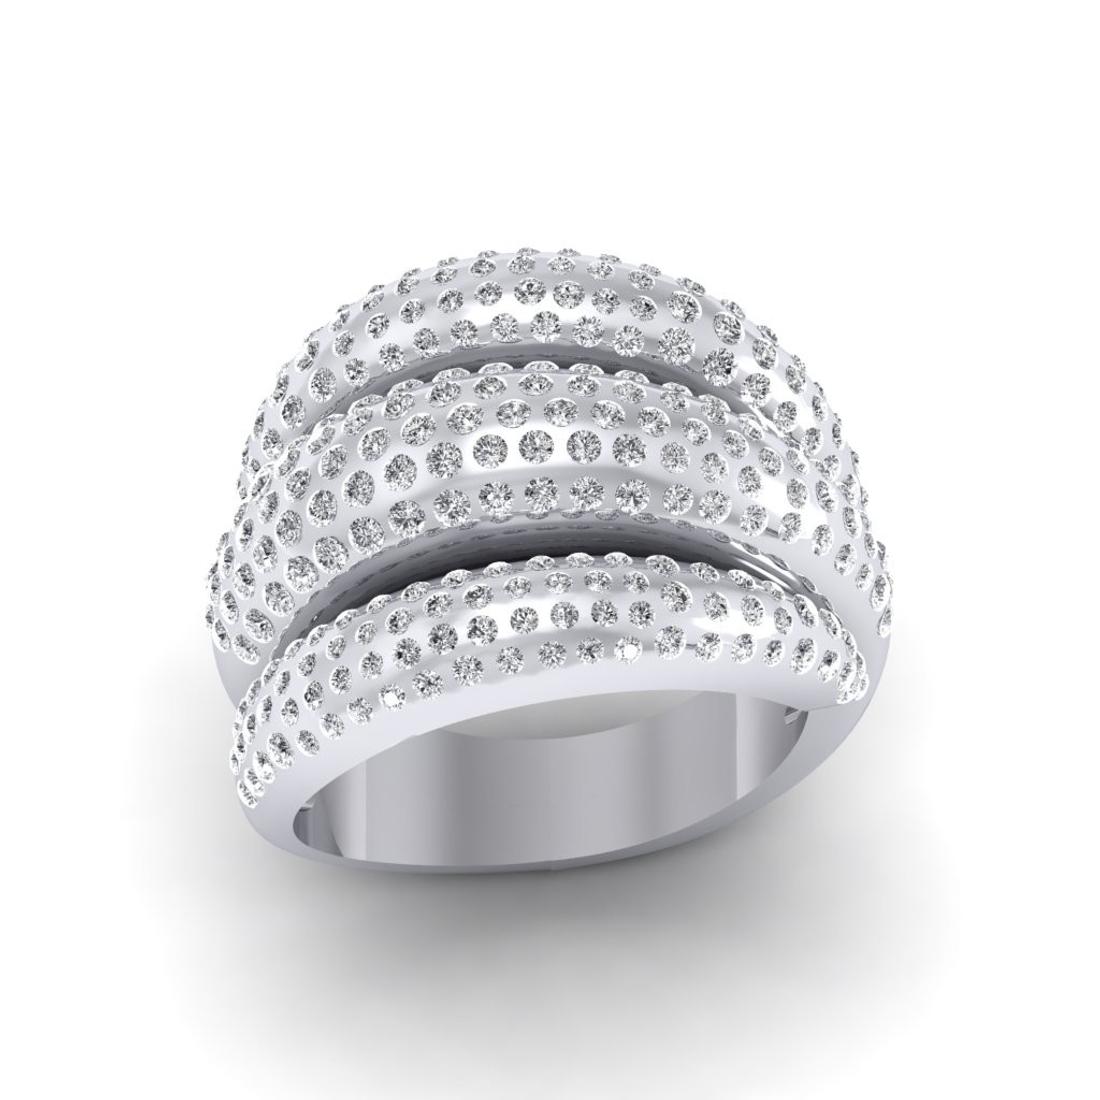 Sarvada Jewels' The Arianna Ring